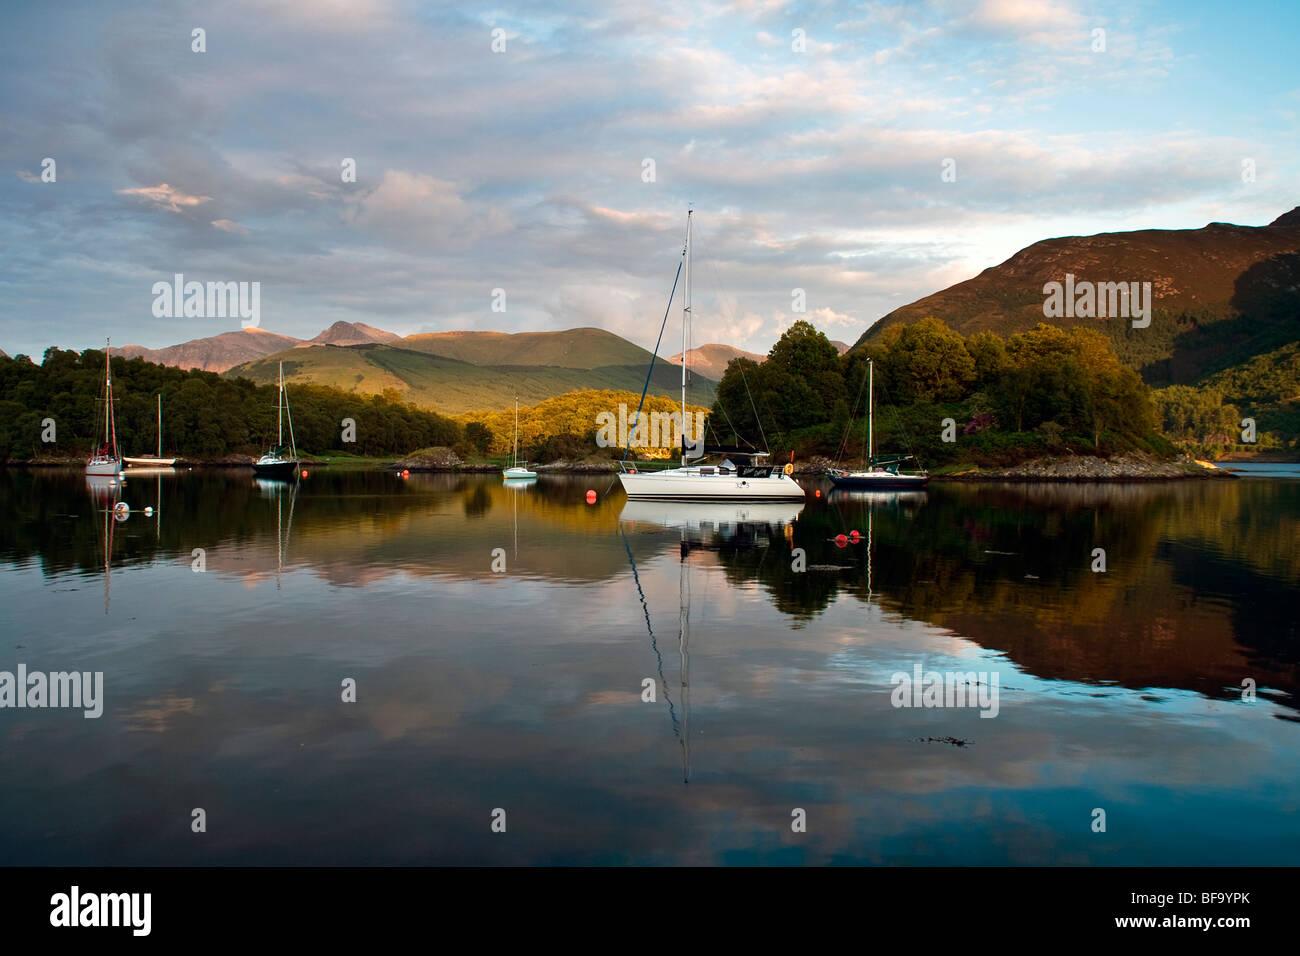 Boats at Loch Leven, near North Ballachulish, Highlands, Sc otland, UK - Stock Image